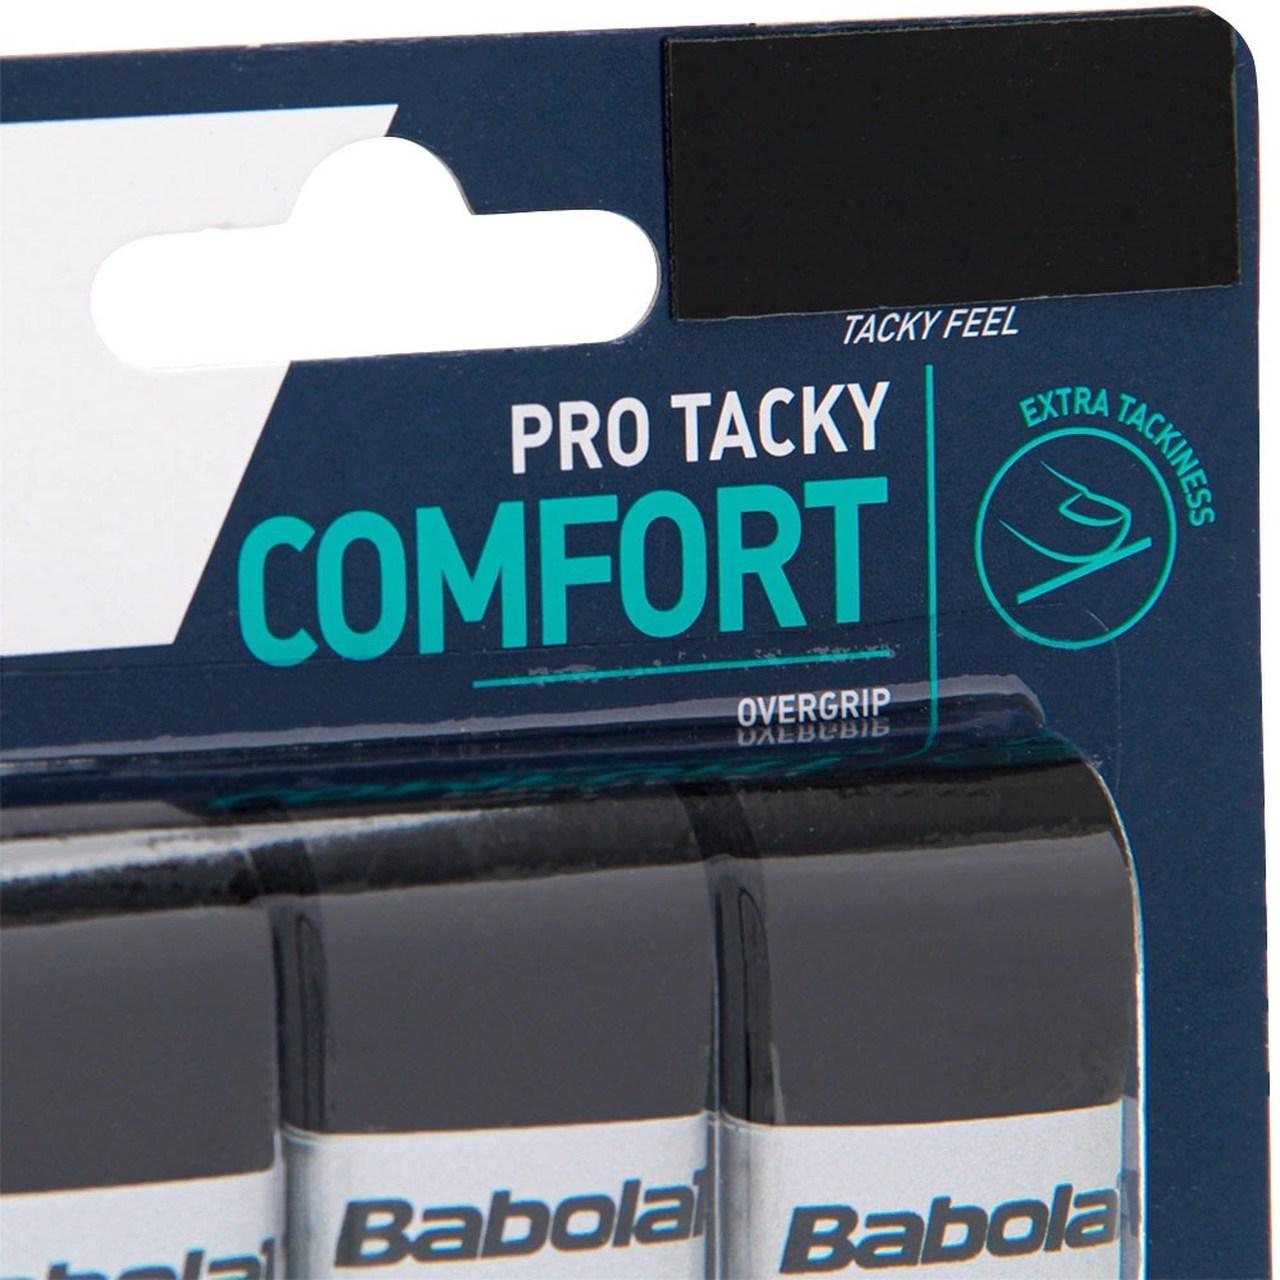 Overgrip Babolat Pro Tacky X3 - Cores  - PROTENISTA